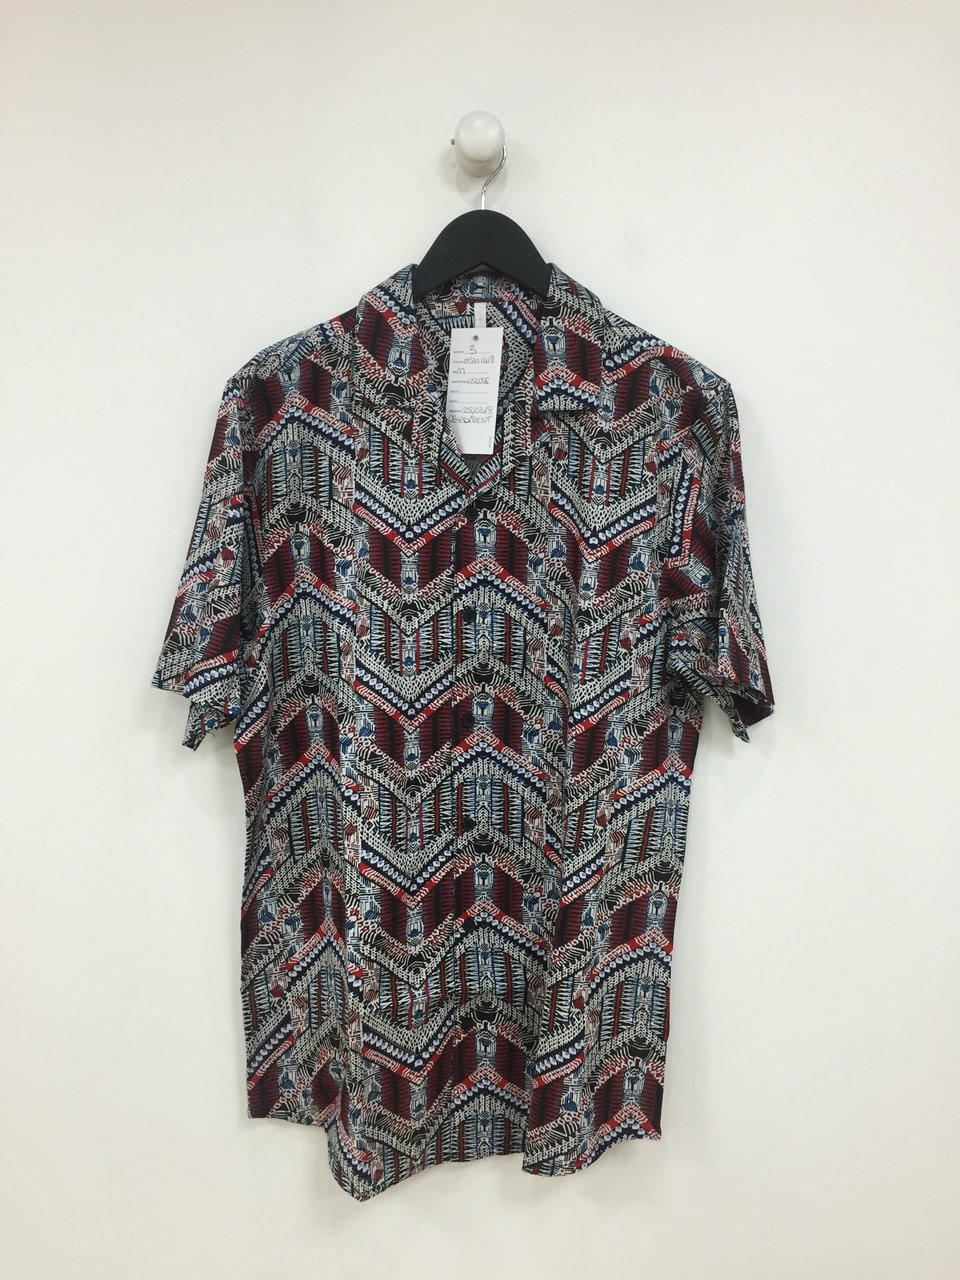 Co-ord Aztec Print Revere Collar Short Sleeve Shirt